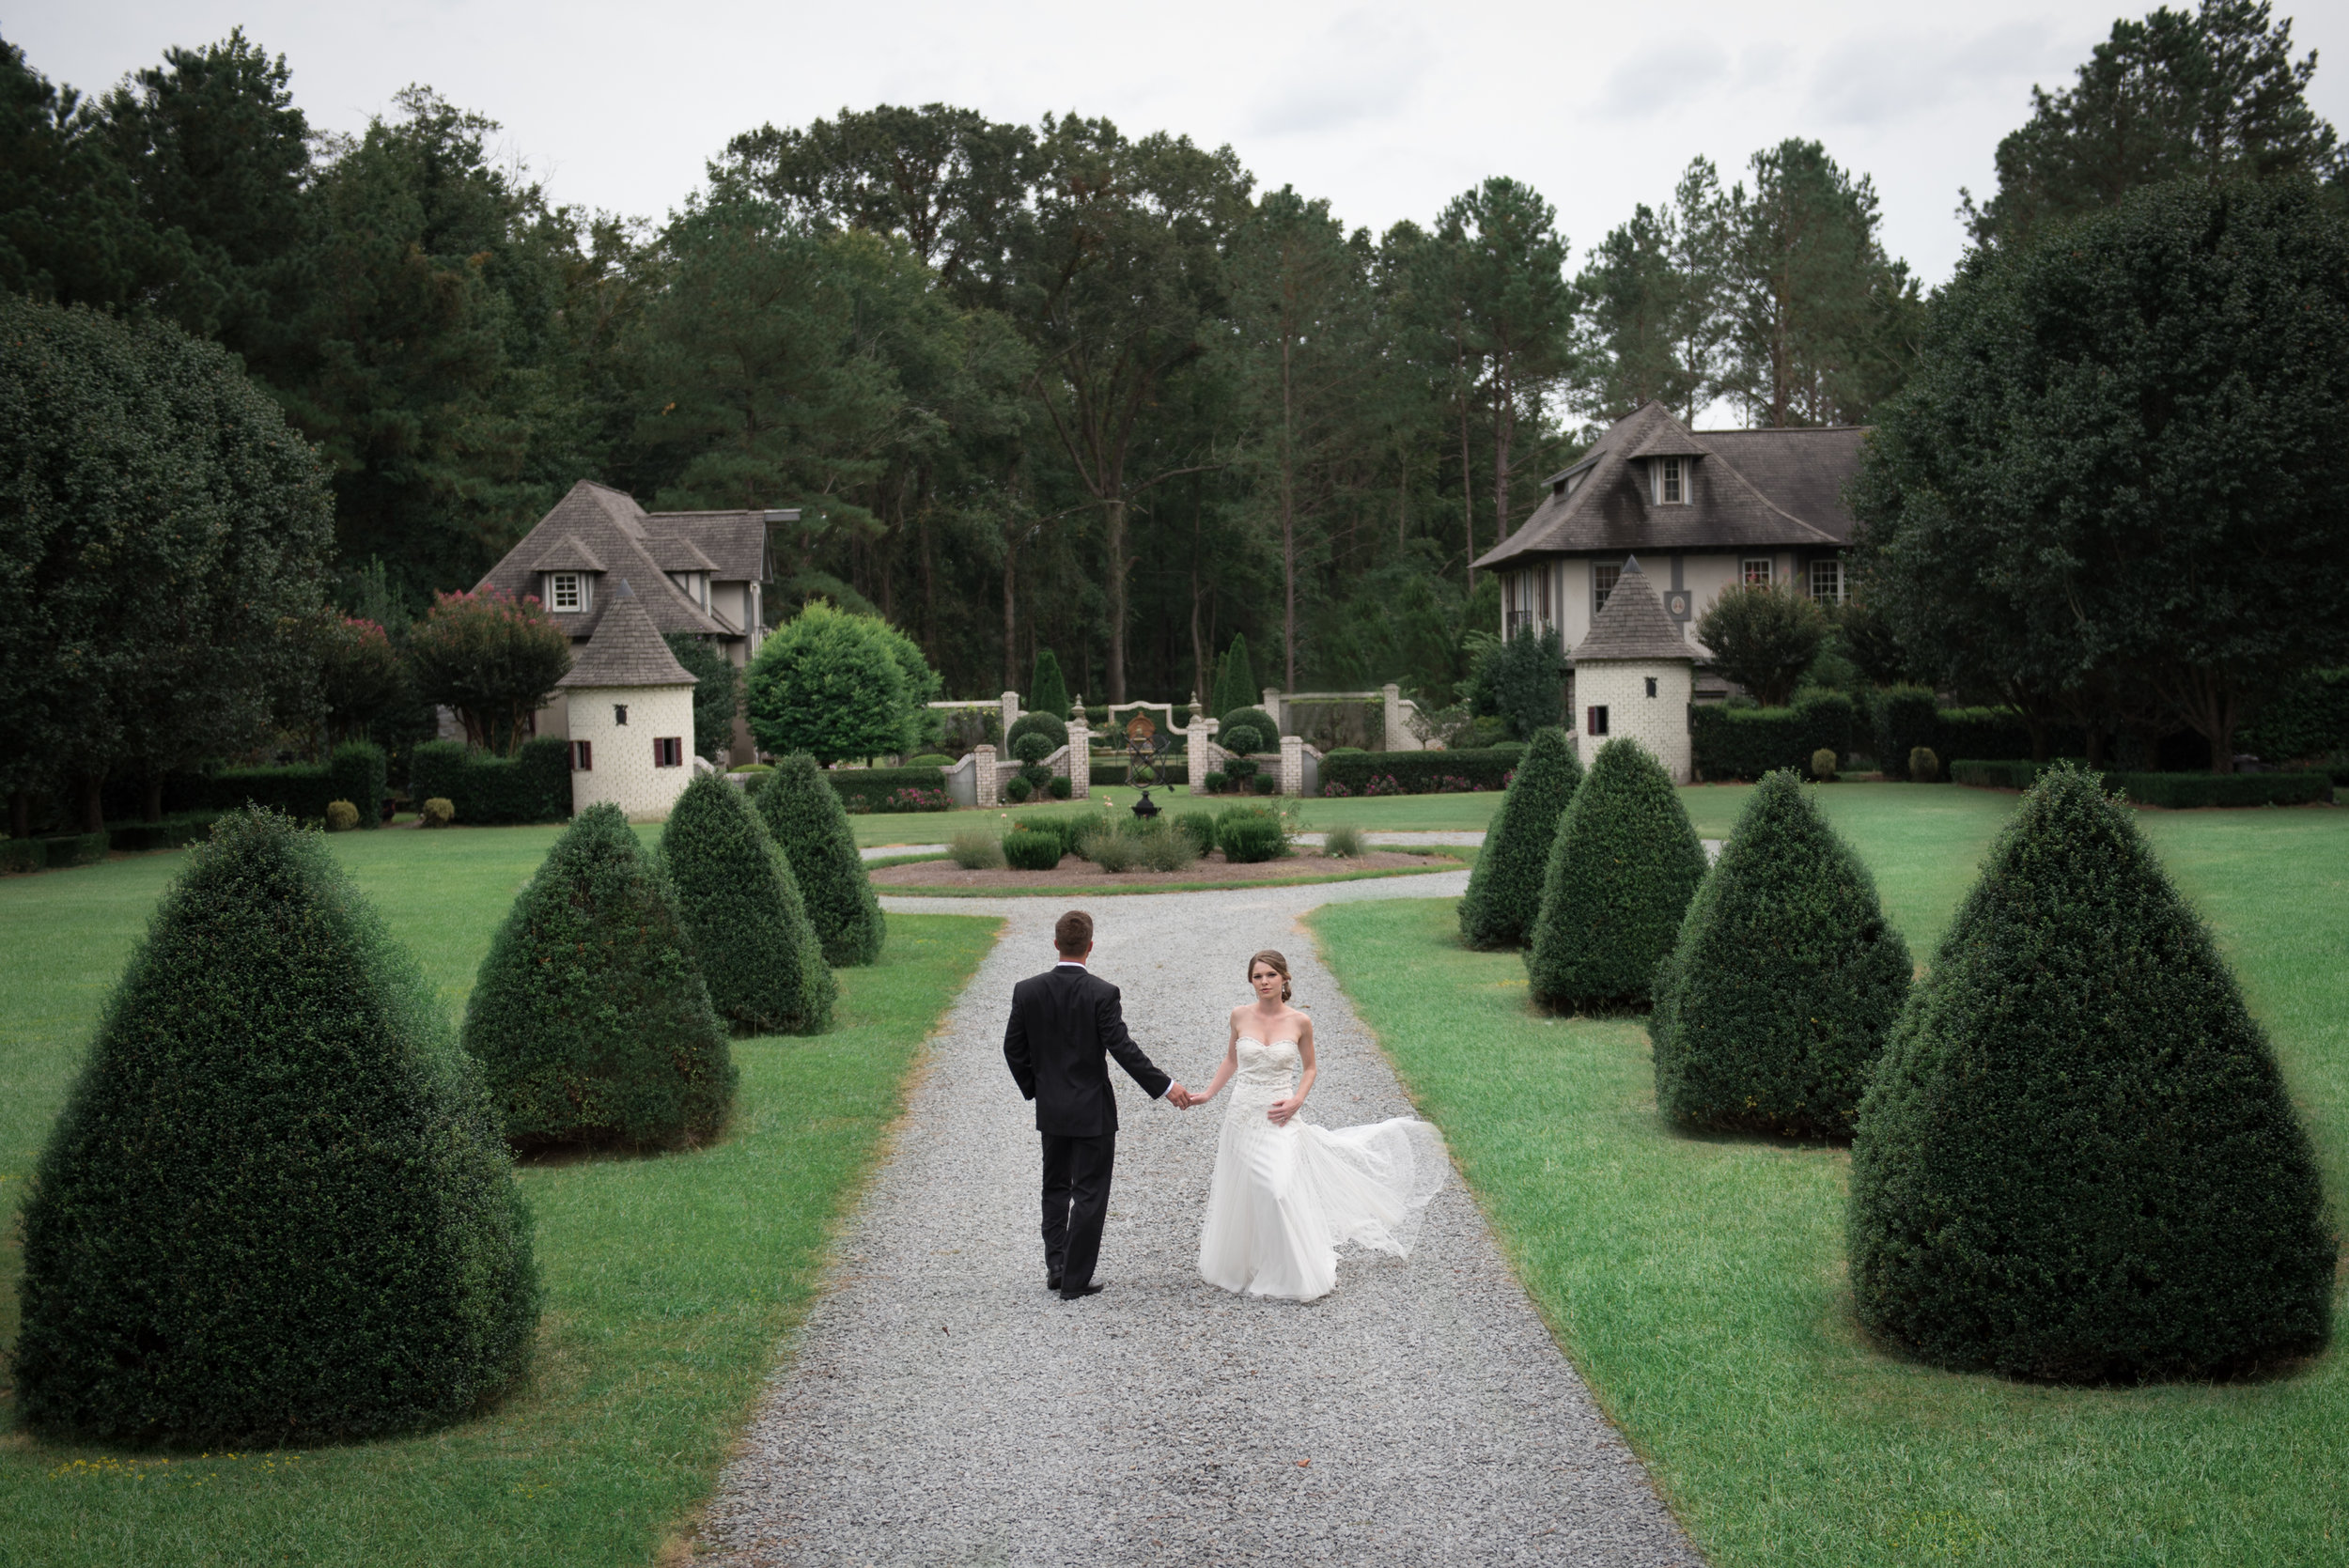 Fox Hollow Wedding Venue photography, Fayetteville, NC | By Yuliya Panchenko